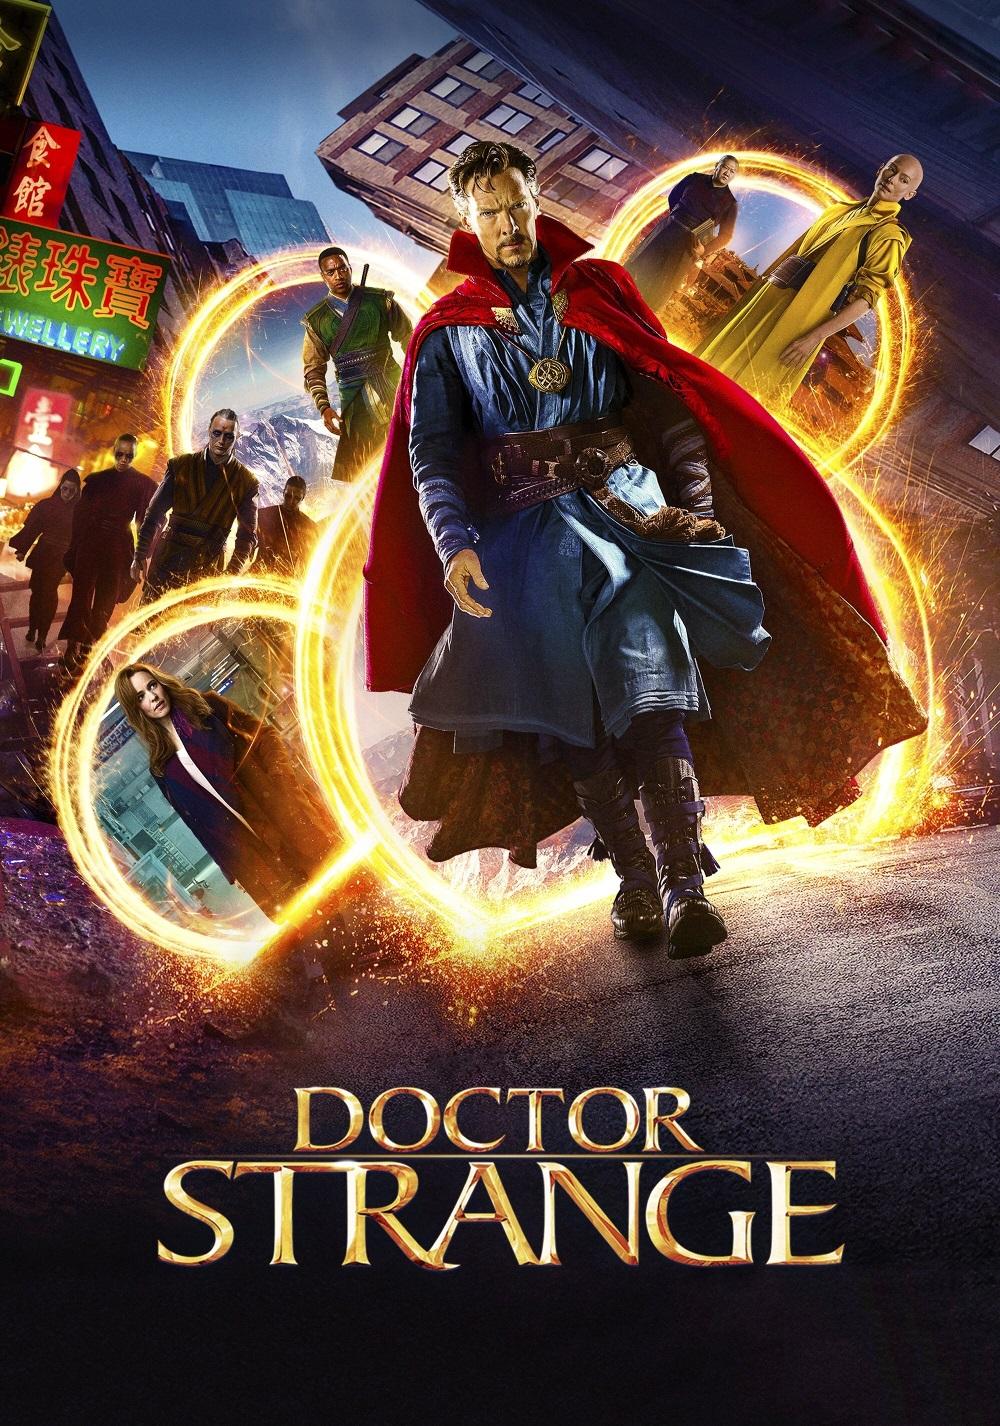 Doctor Strange Movie